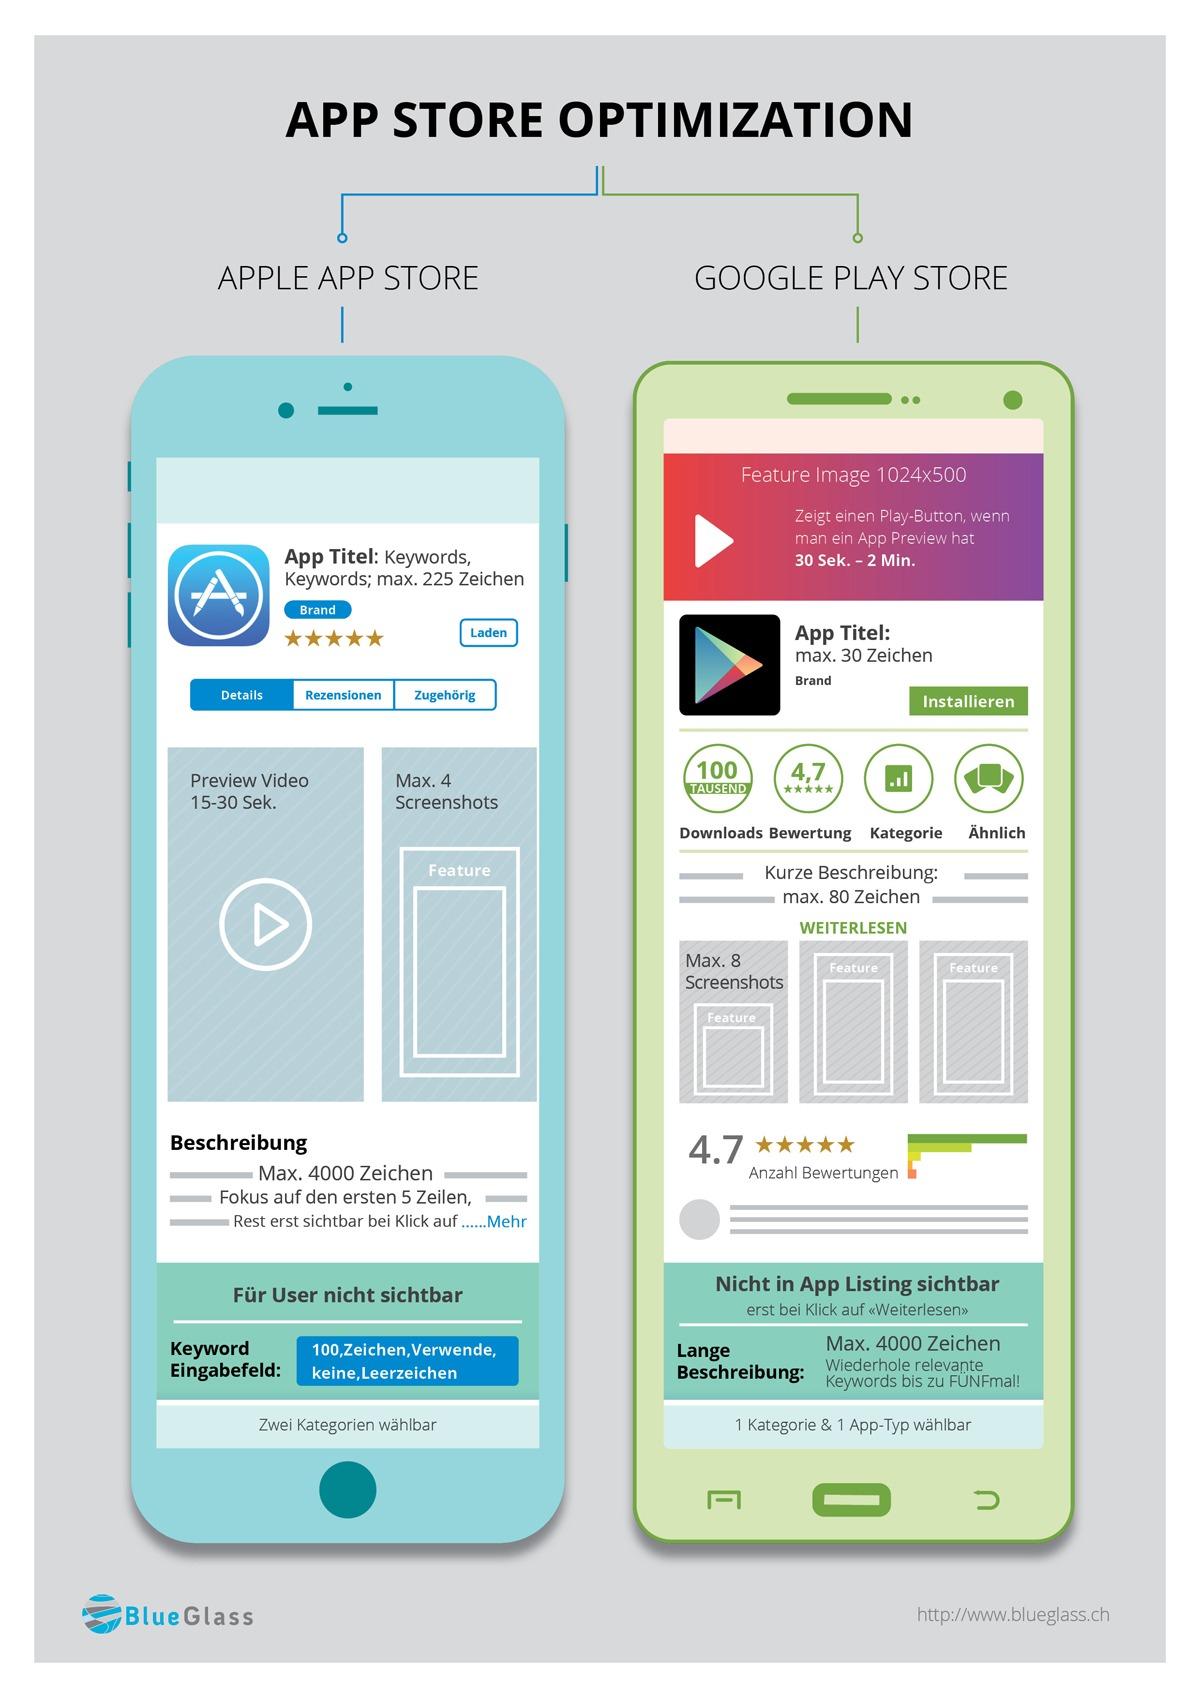 App Store Optimization Infographic